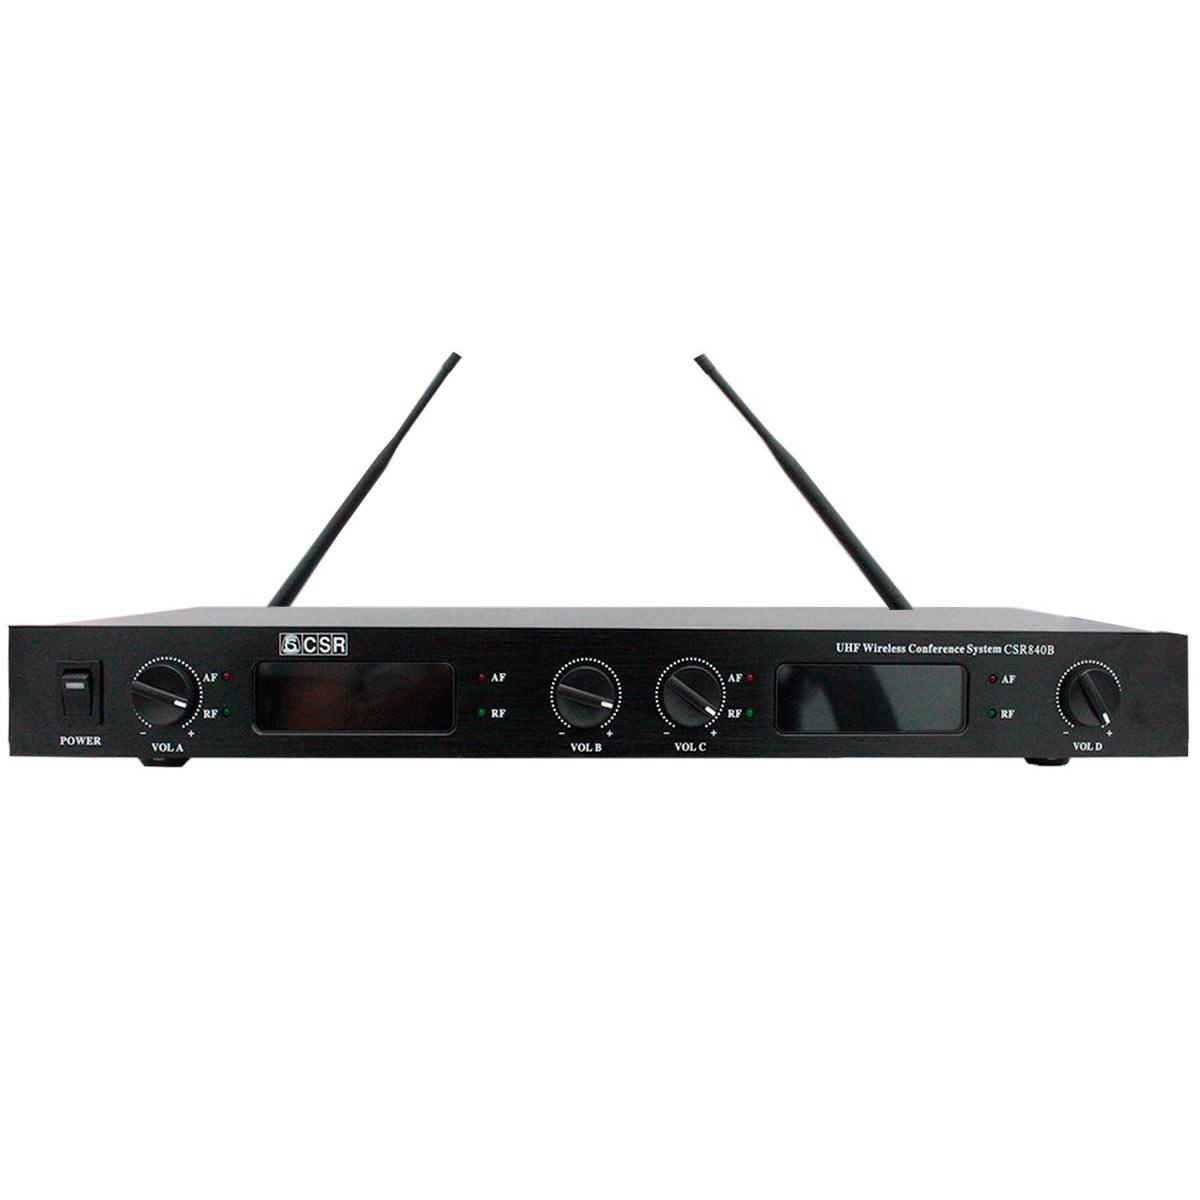 Microfone Gooseneck sem Fio 48 Centímetros UHF (4 Unidades) - 840 B CSR